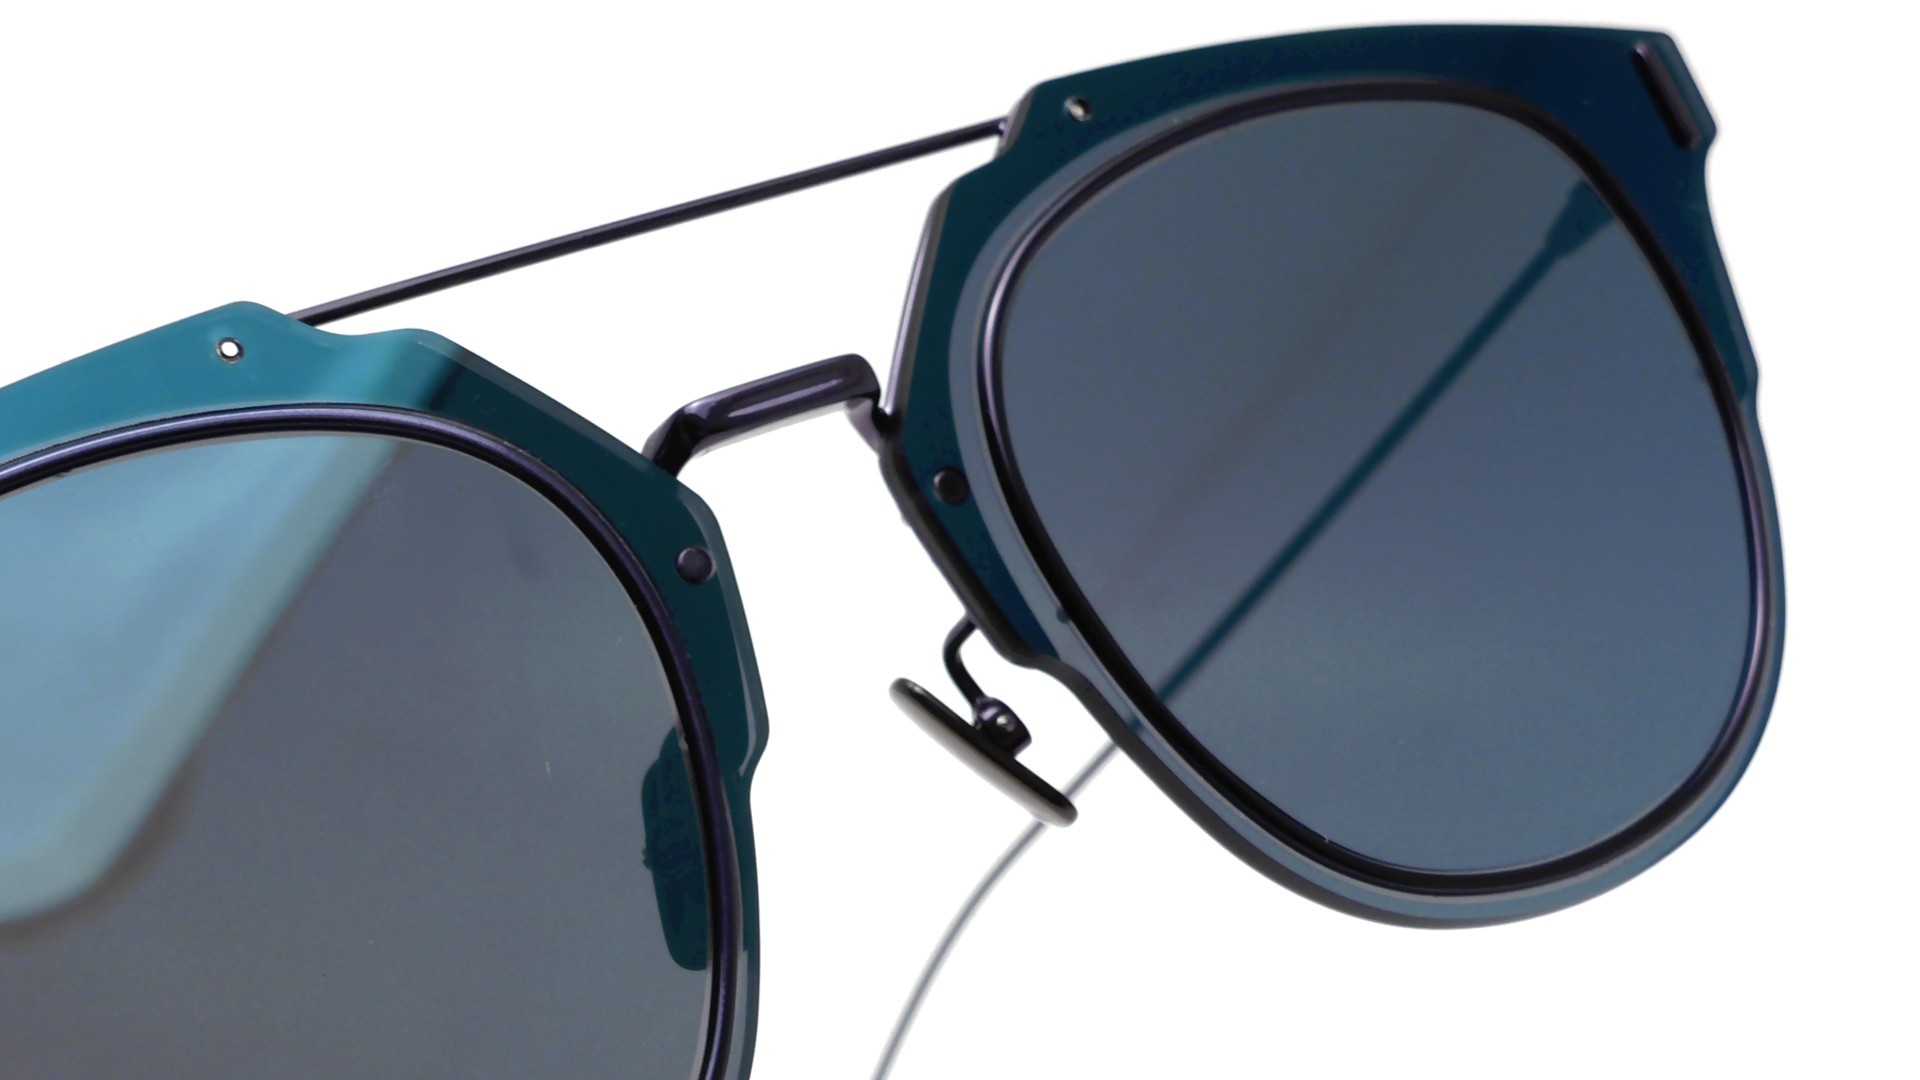 b7d50f79e8a Dior Composit Blue 1.0 A2J 2A 62-12